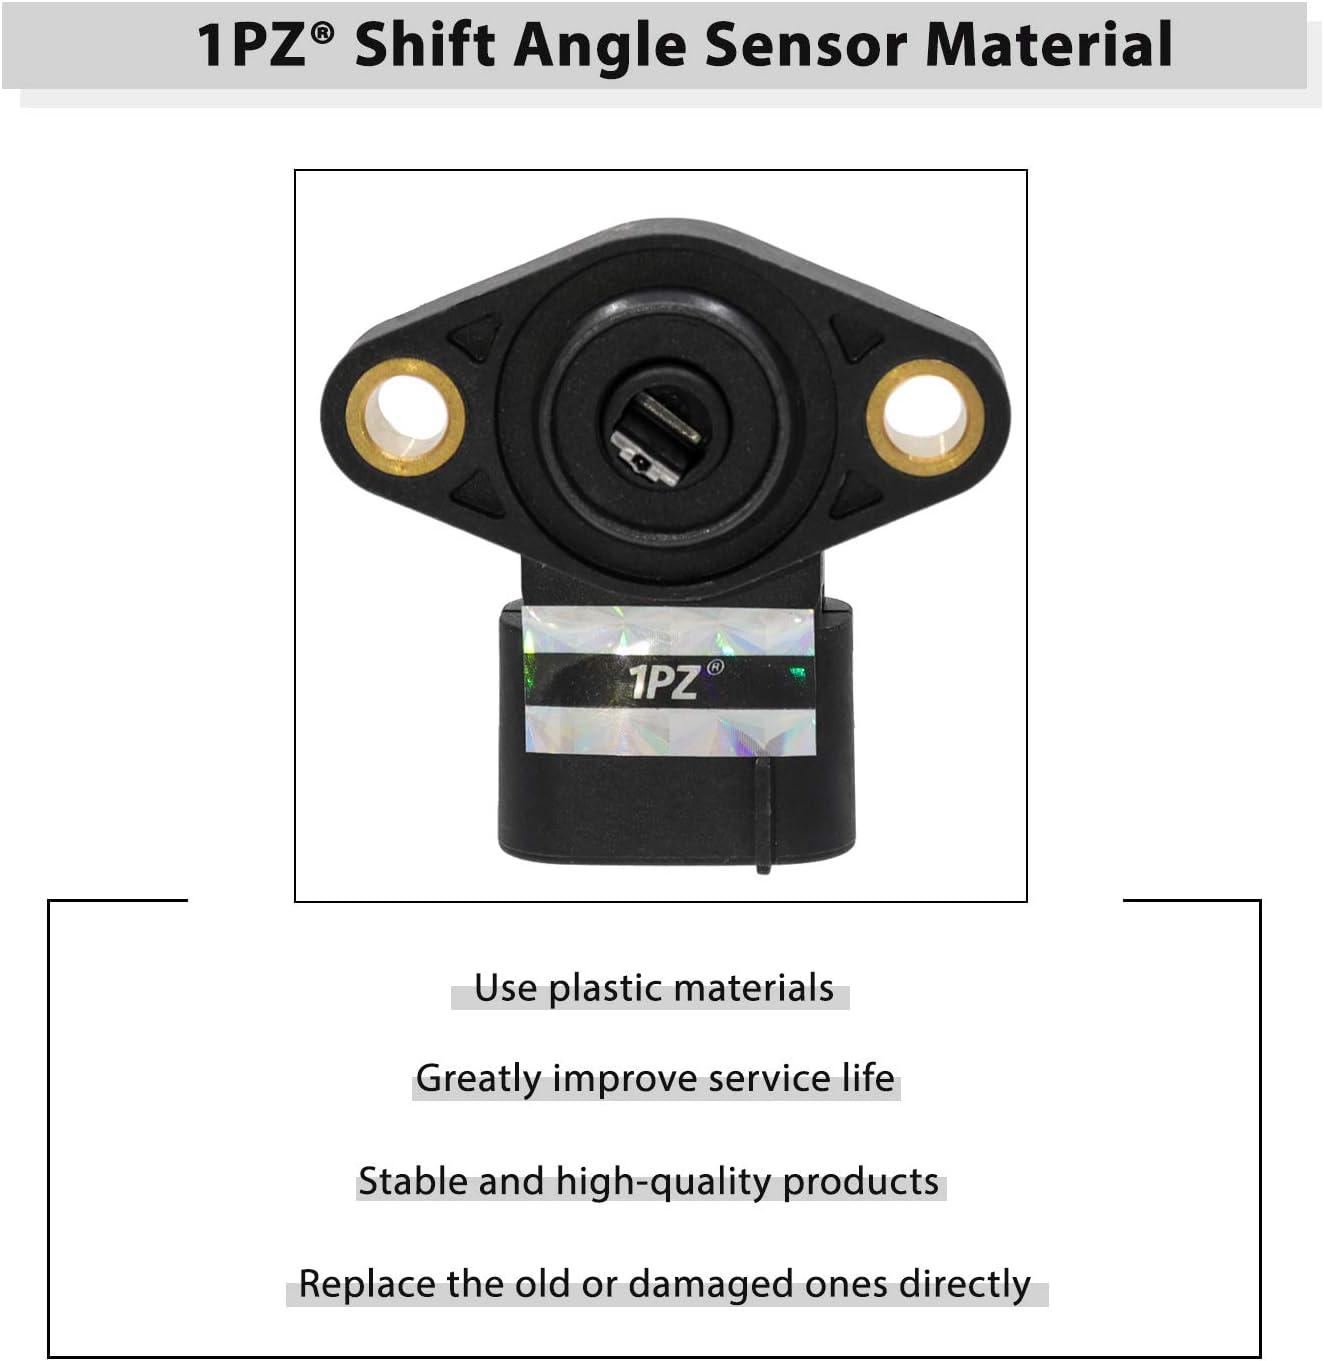 1PZ T35-SA1 Shift Angle Sensor for Honda Recon Rancher Foreman SXS500M2 SXS1000M5D TRX250 TRX350 TRX420 TRX500 Pioneer 500 1000 2002-2019 38800-HP0-A11 38800-HR3-A21